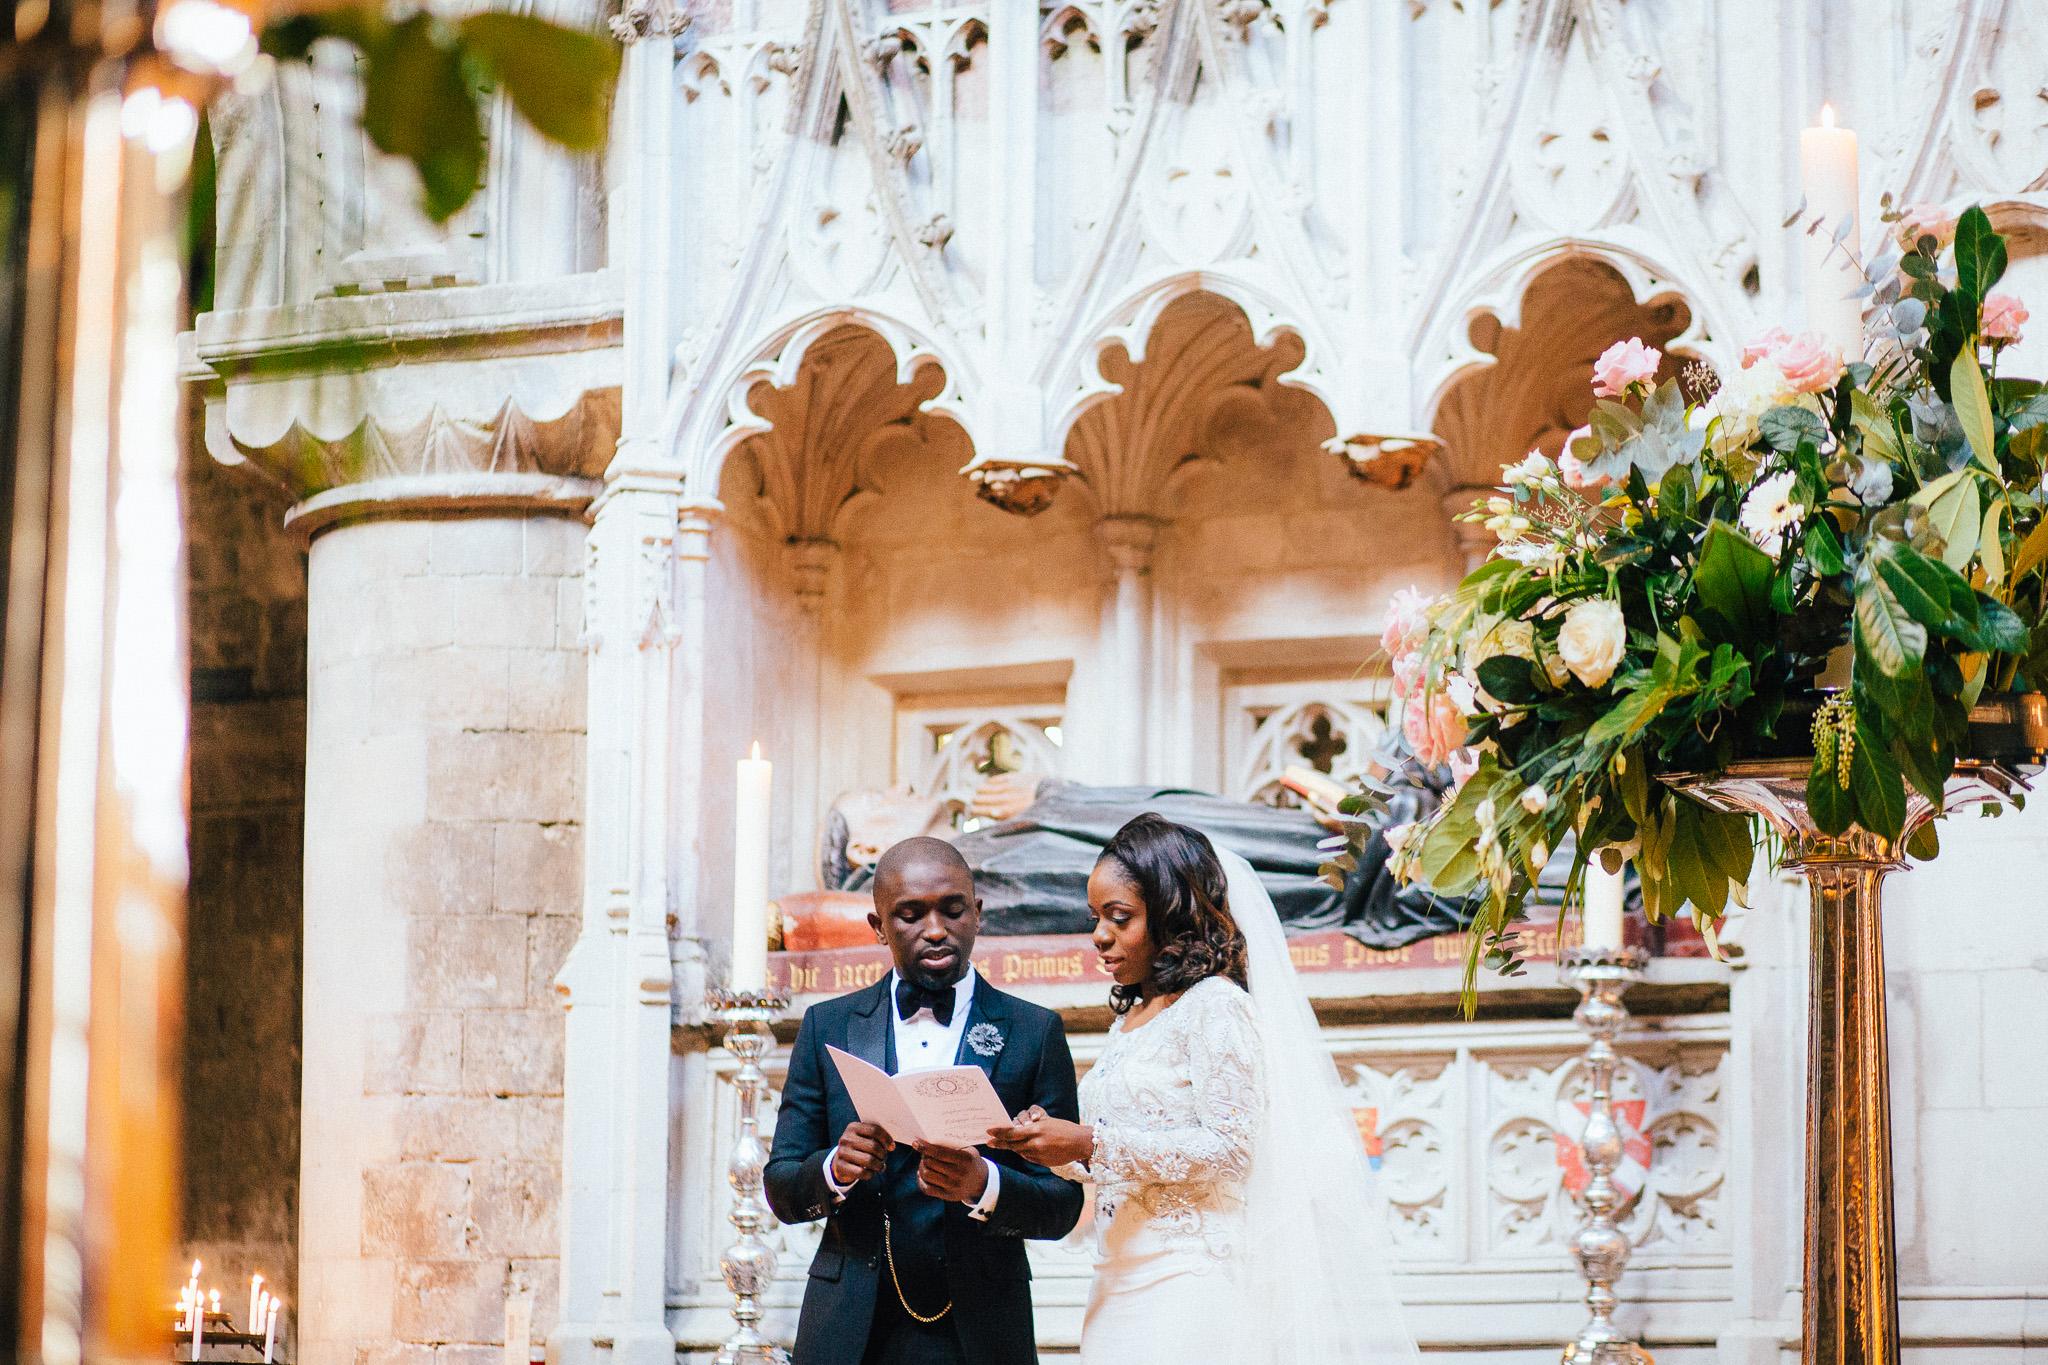 london-wedding-photographer-nigerian-montecalm-stbartholemew-plaisterers-57.jpg